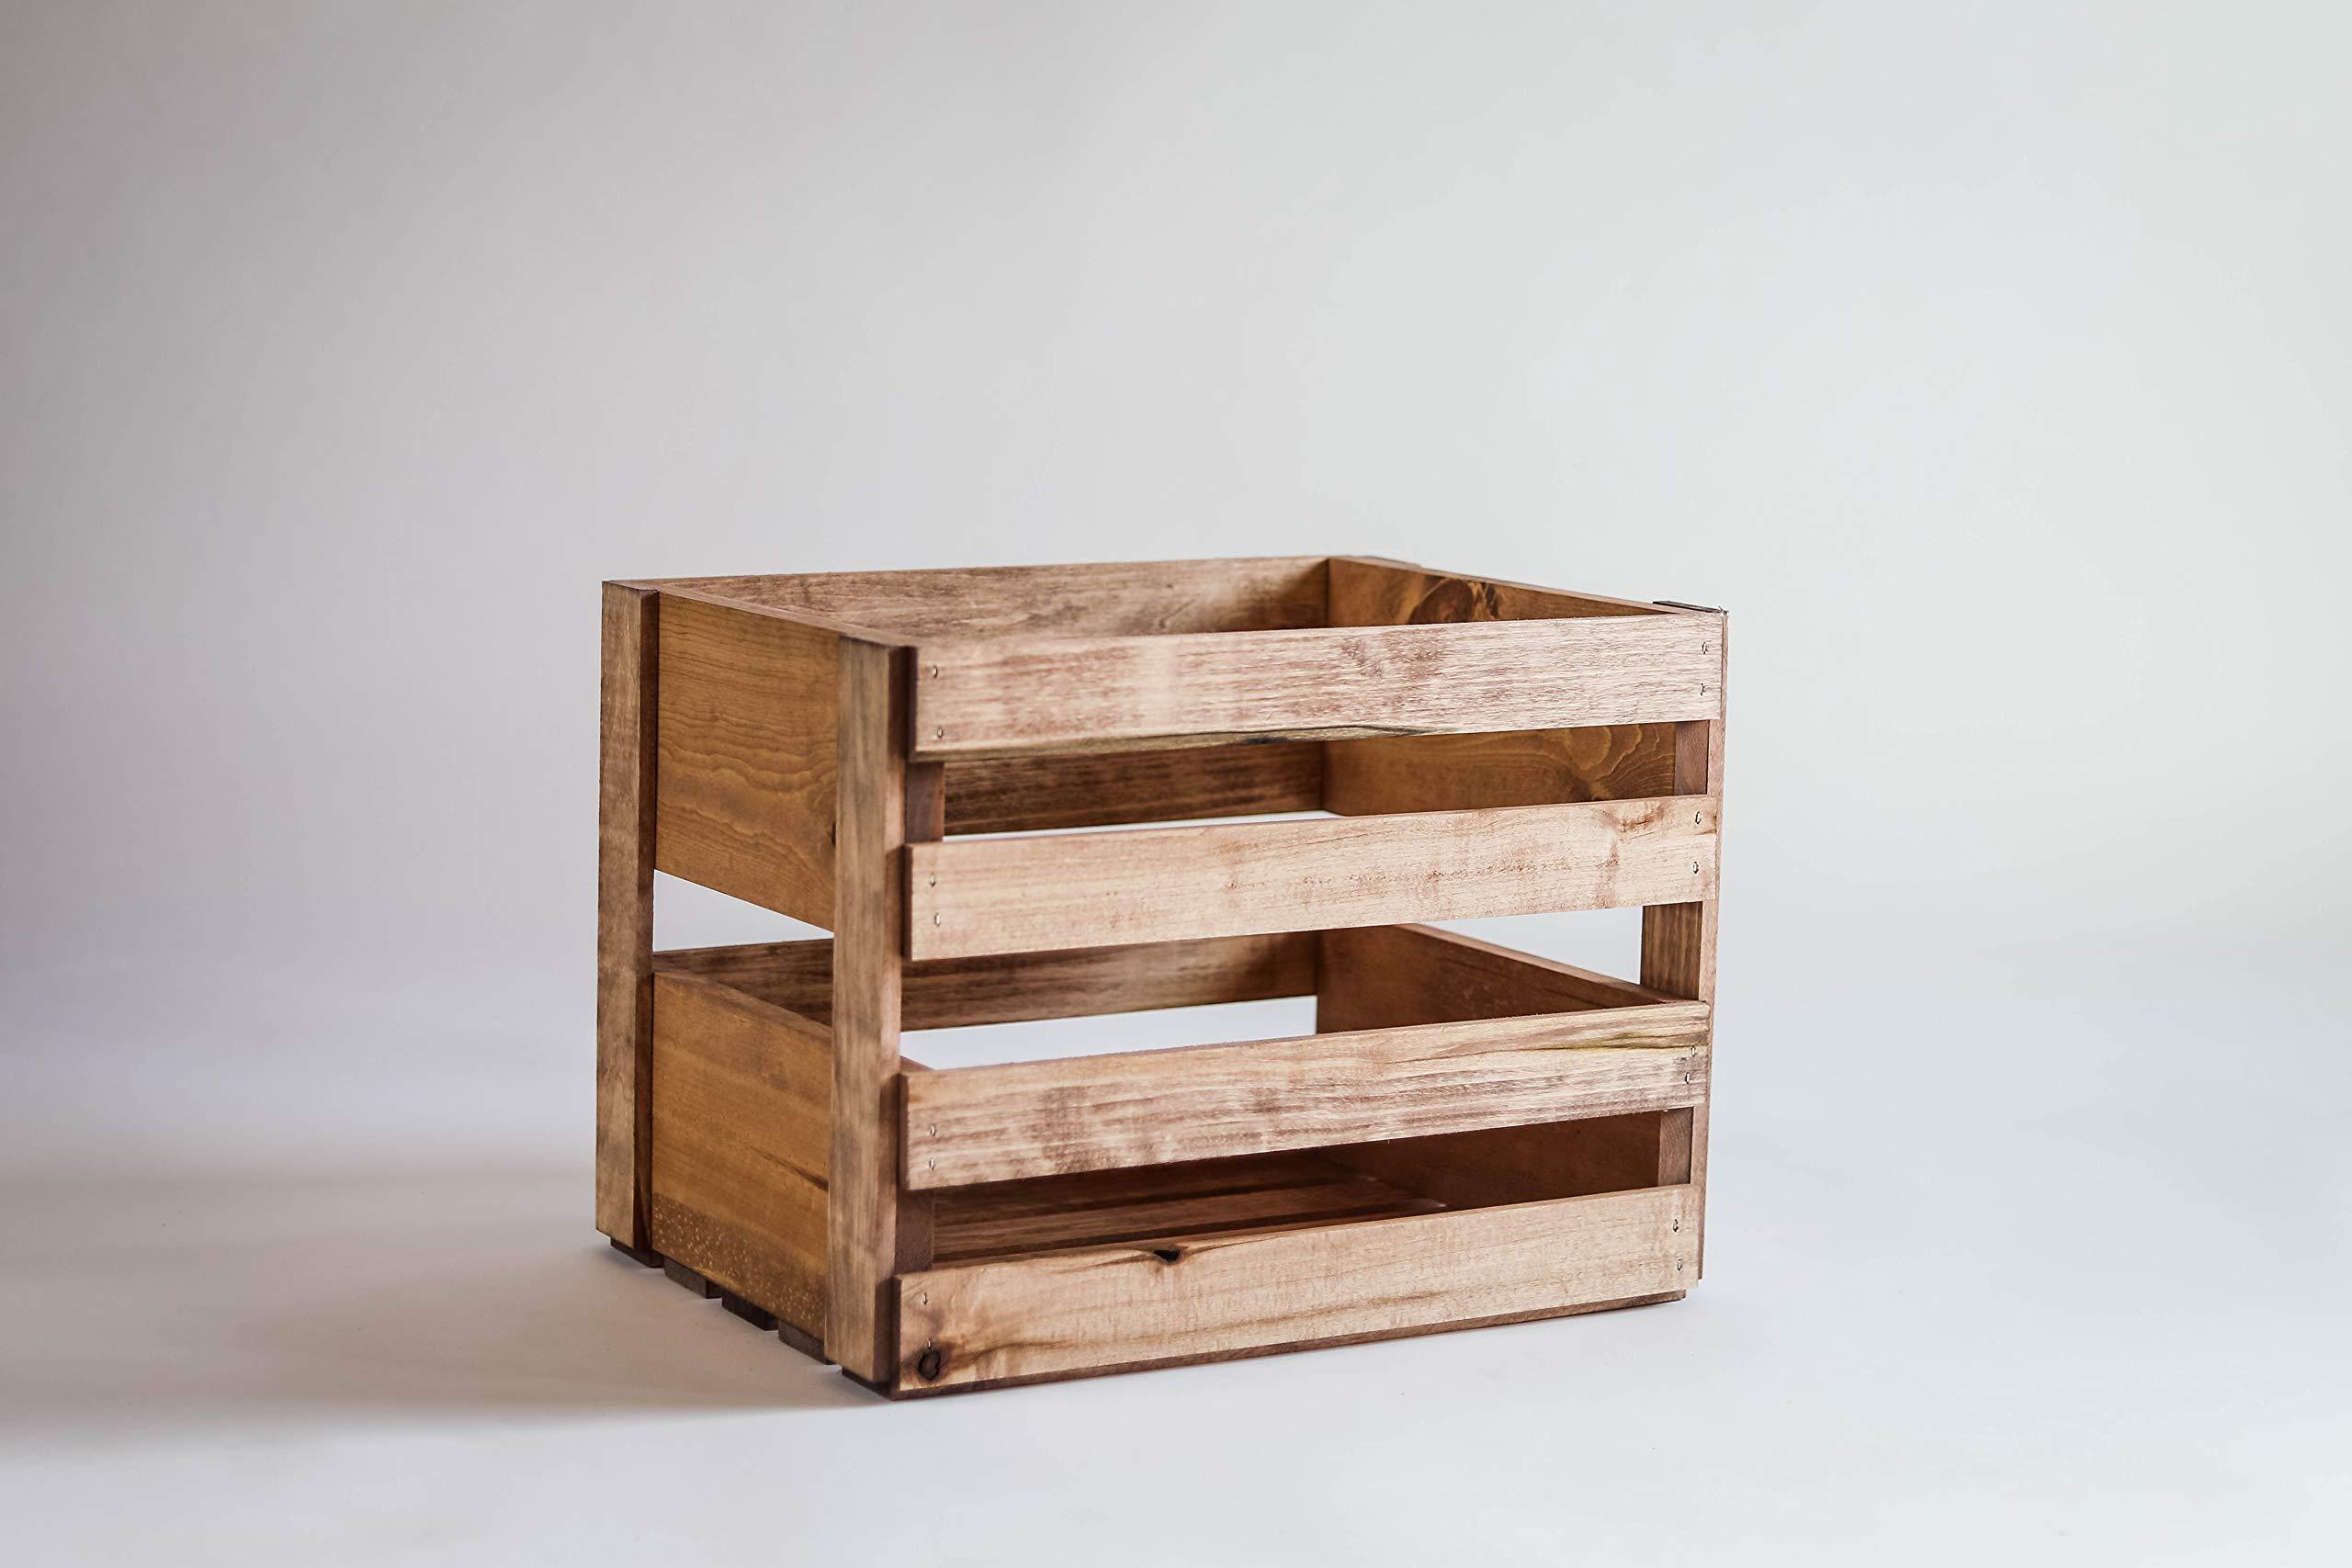 Darla'Studio 66 Vinyl Record Holder Wood Crate by Darla'Studio 66